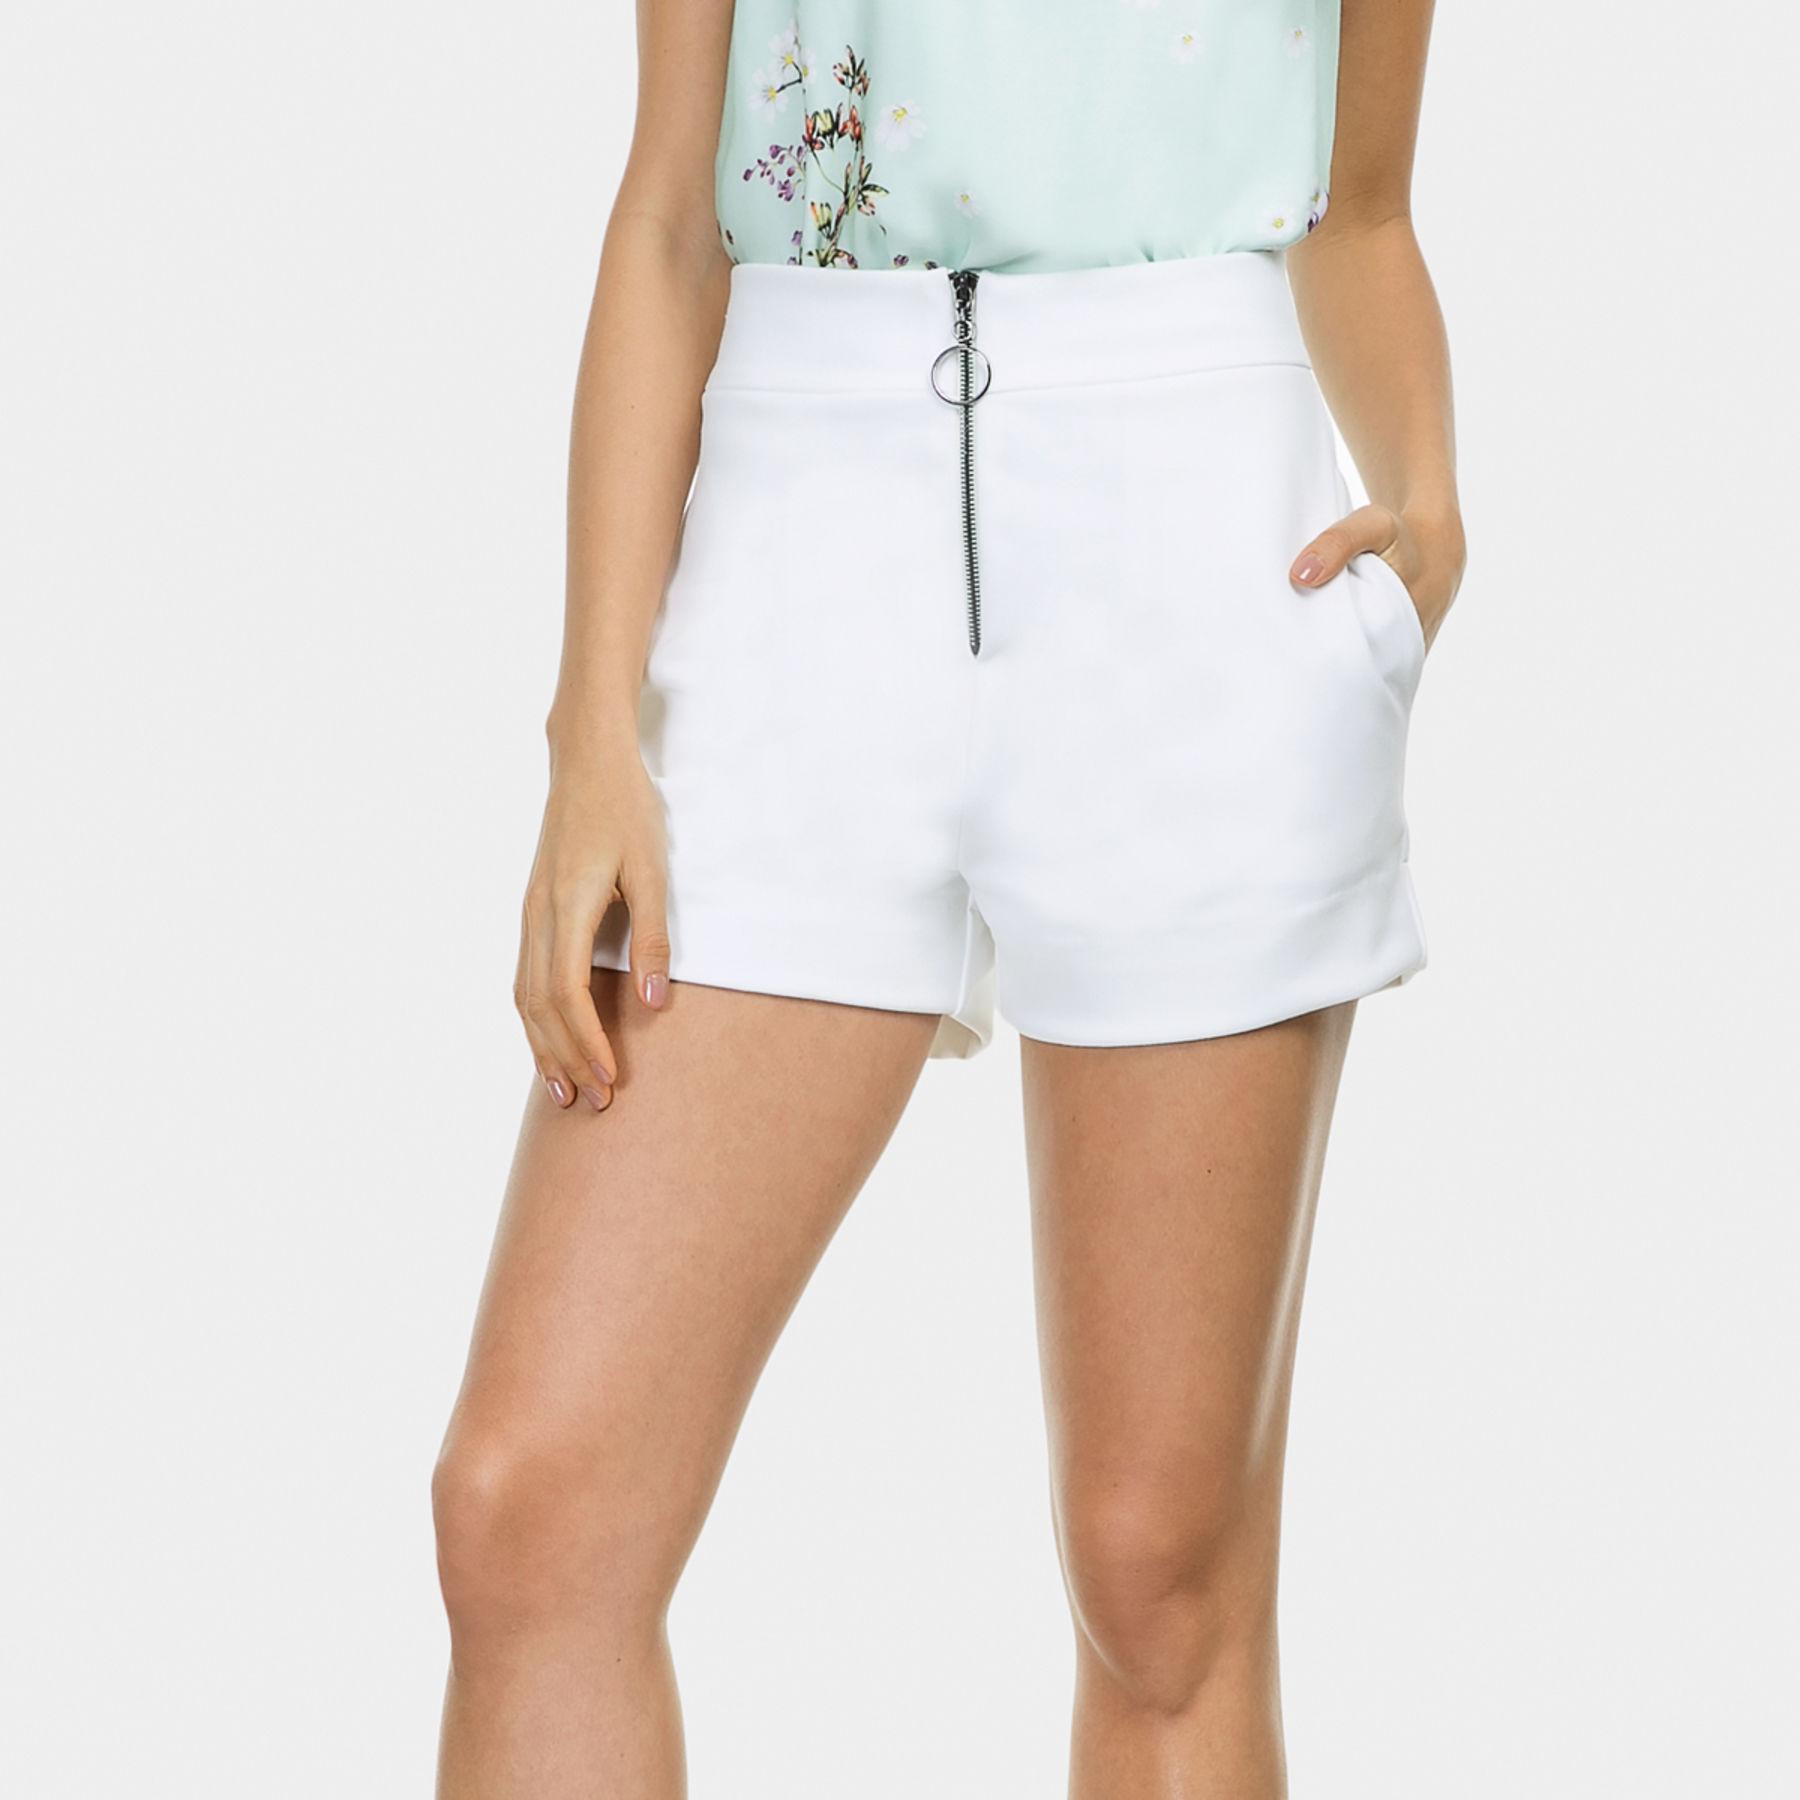 5f9e60a715 Shorts Cintura Alta Zíper Malha Branco Off White - Lez a Lez